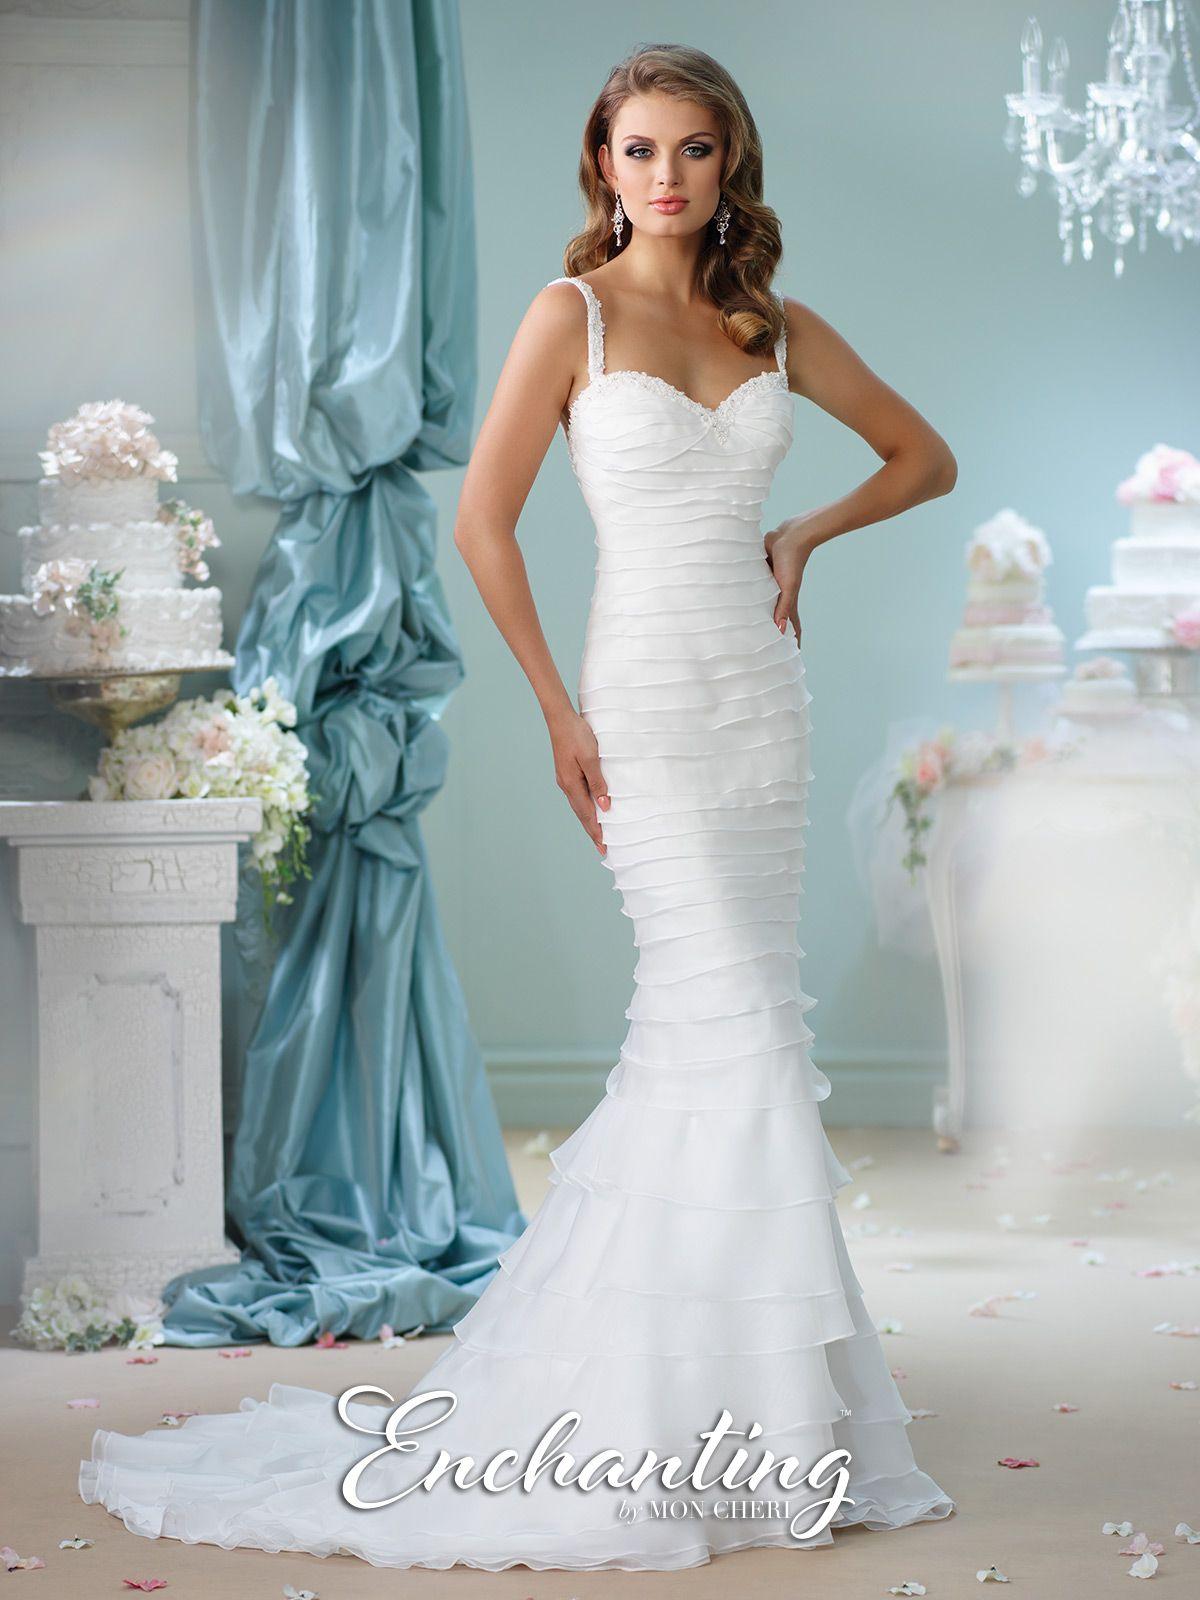 Modern Wedding Dresses 2018 by Mon Cheri | Mermaid gown, Ivory white ...